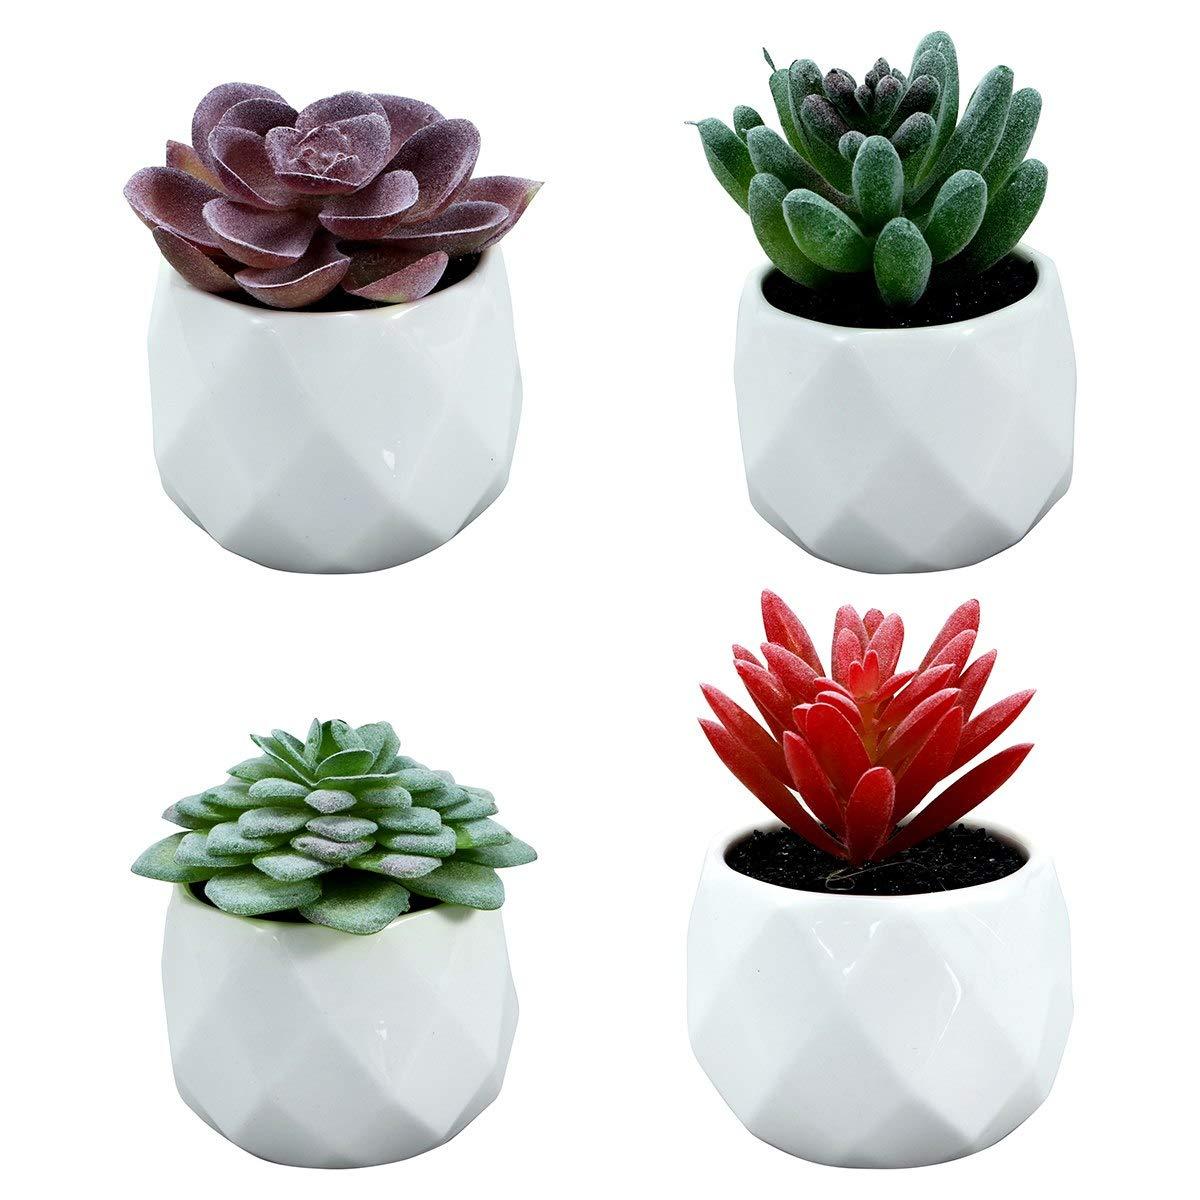 Pinkdose Bestoyard 4 Pezzi Decorativi Faux Succulente Artificiale Succulente Simulazione falsificata con vasi.